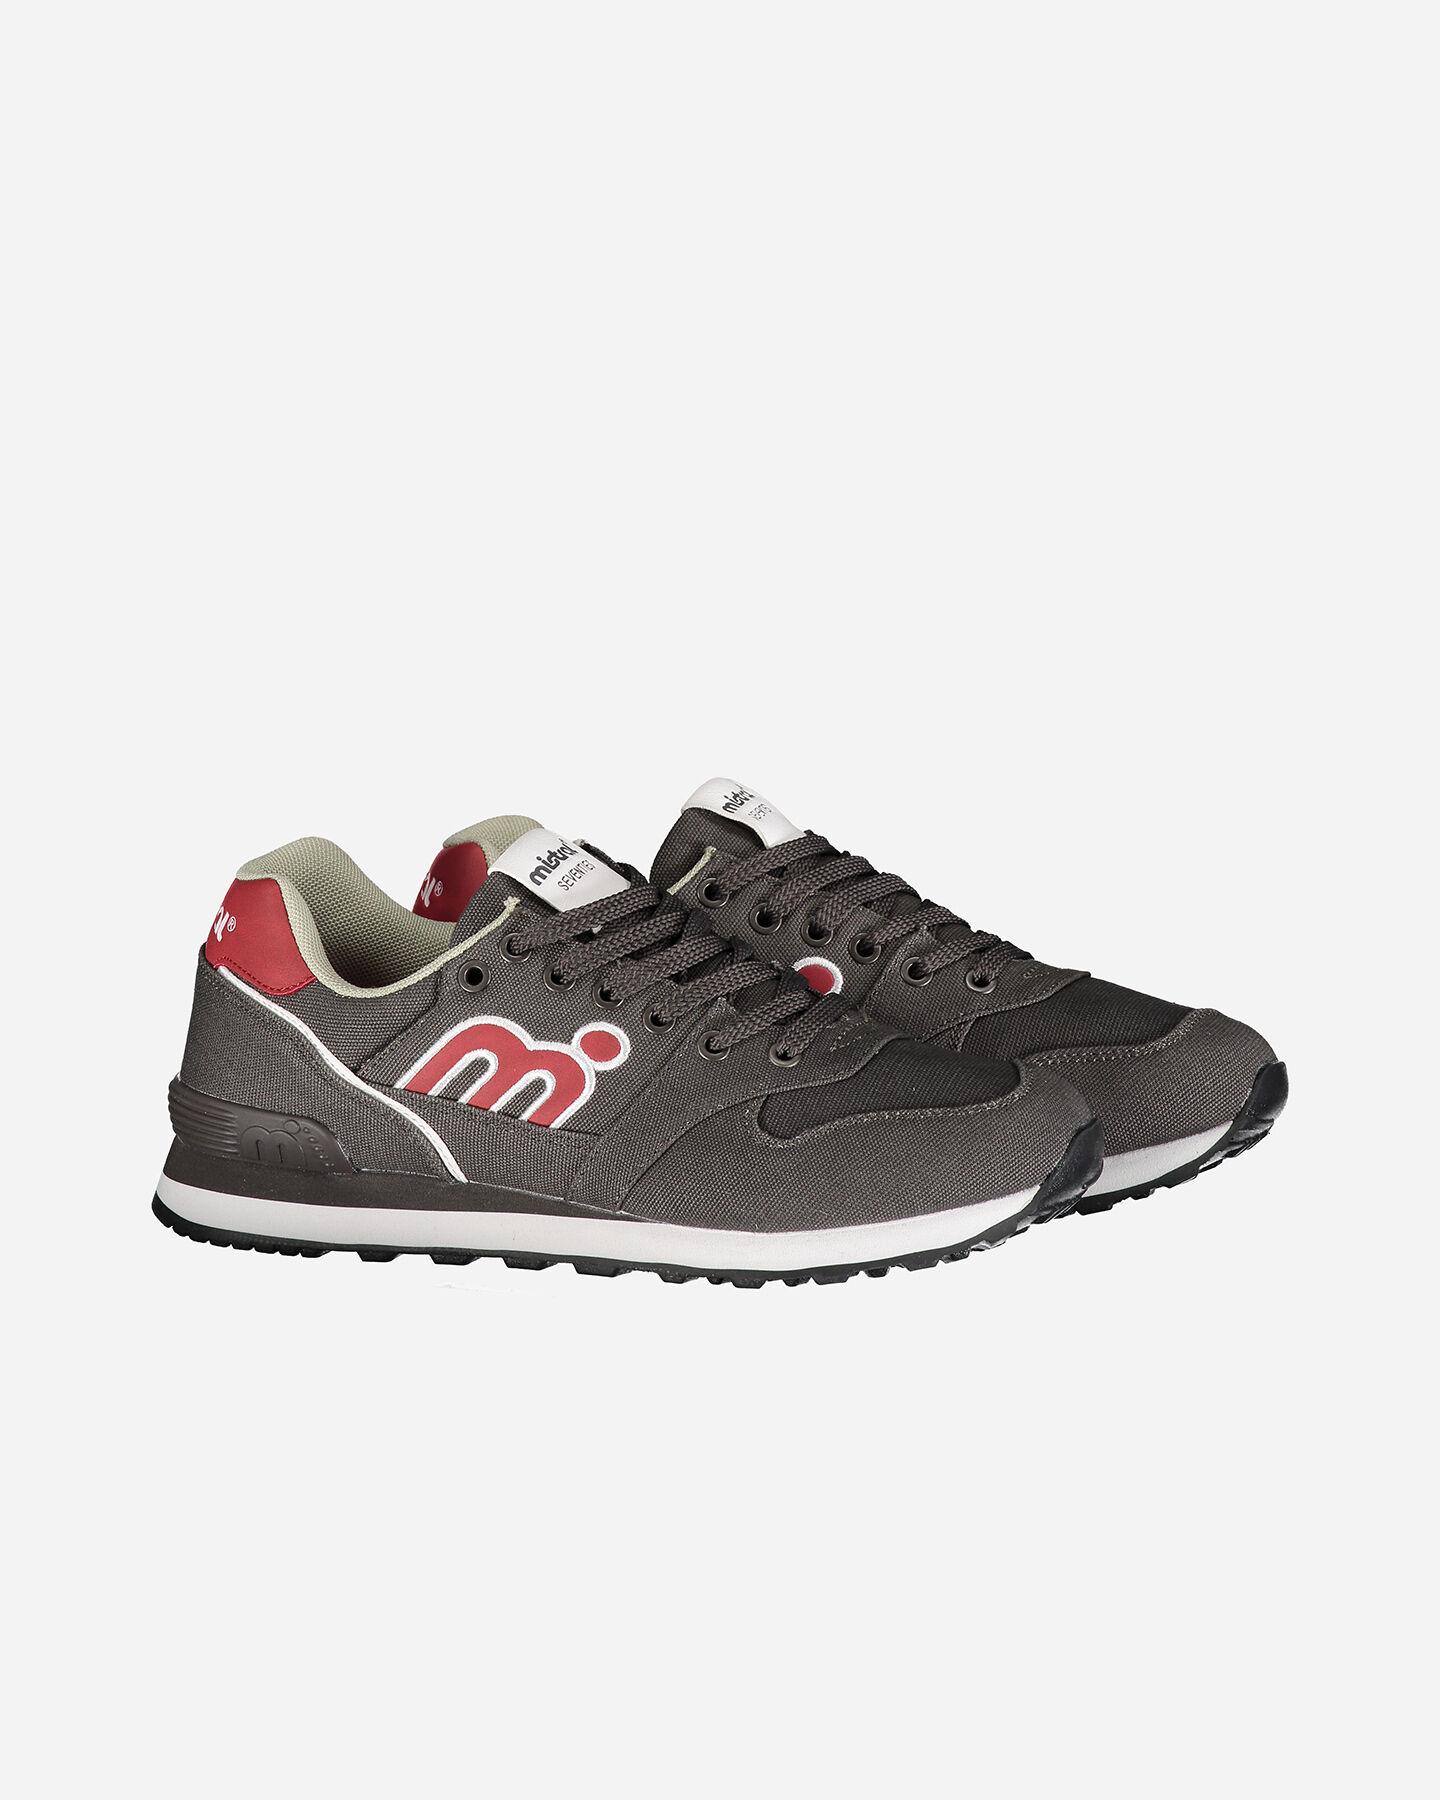 Scarpe sneakers MISTRAL SEVENTIES CANVAS M S4089464 scatto 1